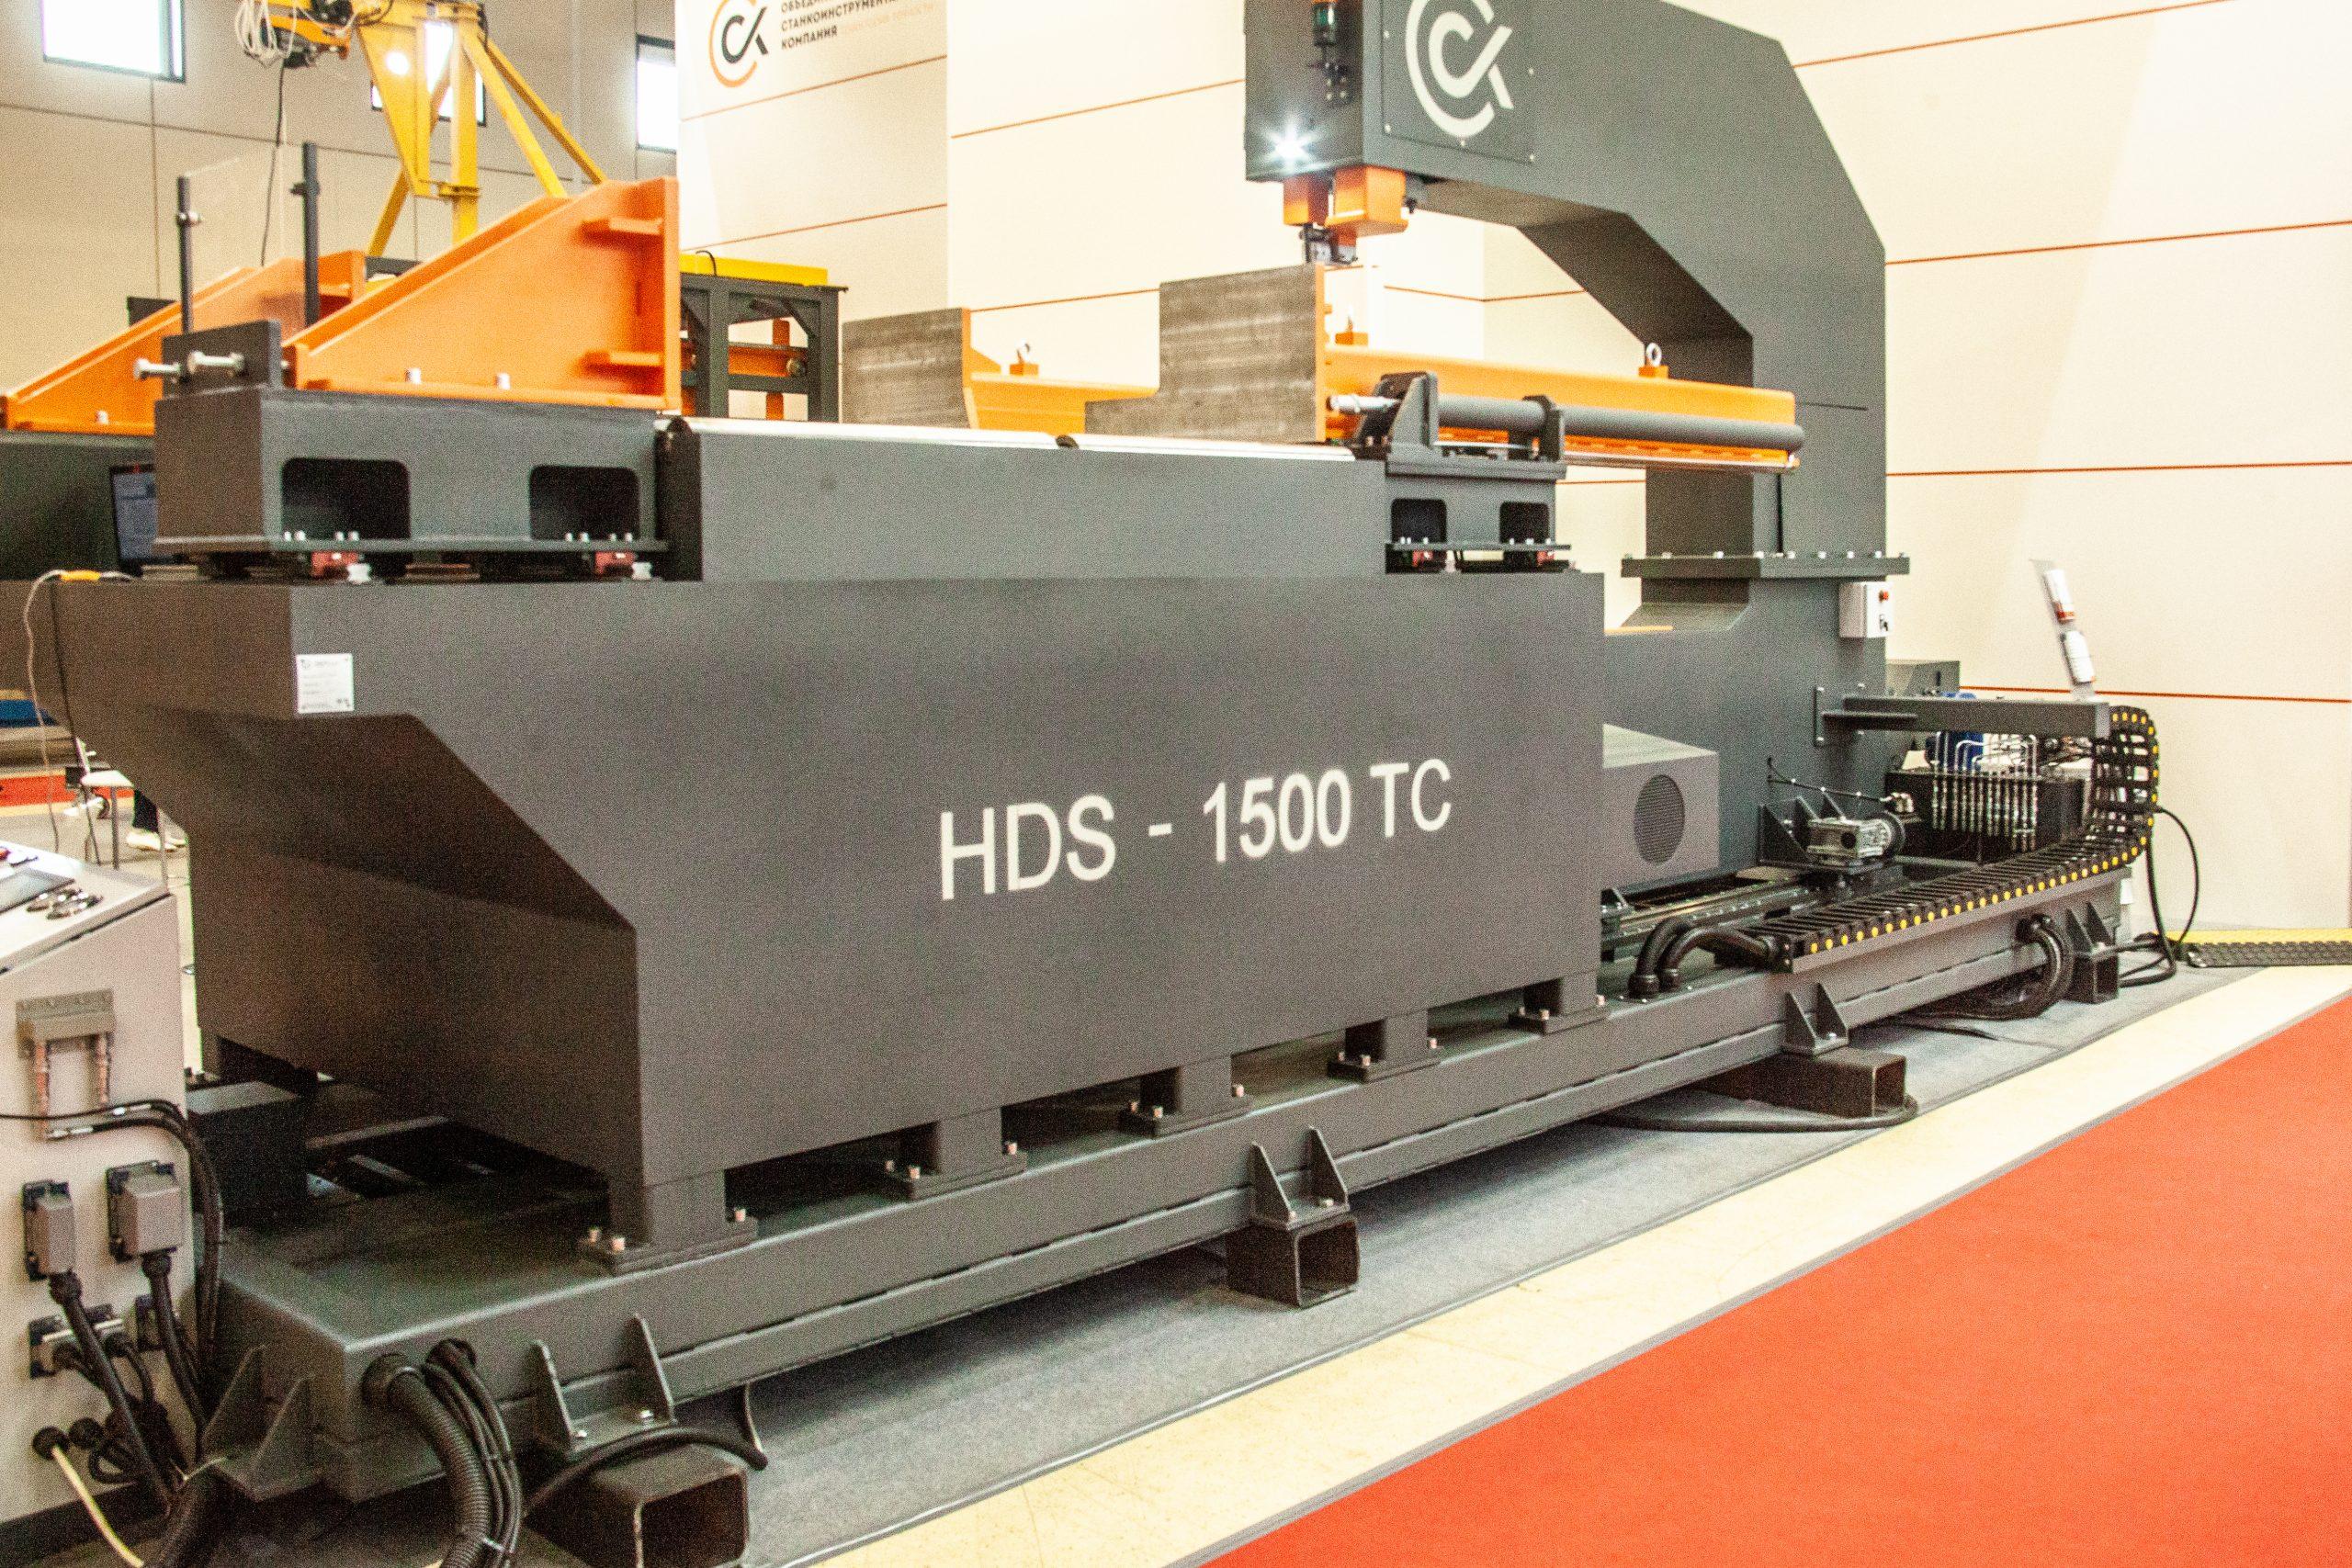 станок hds 1500 tc